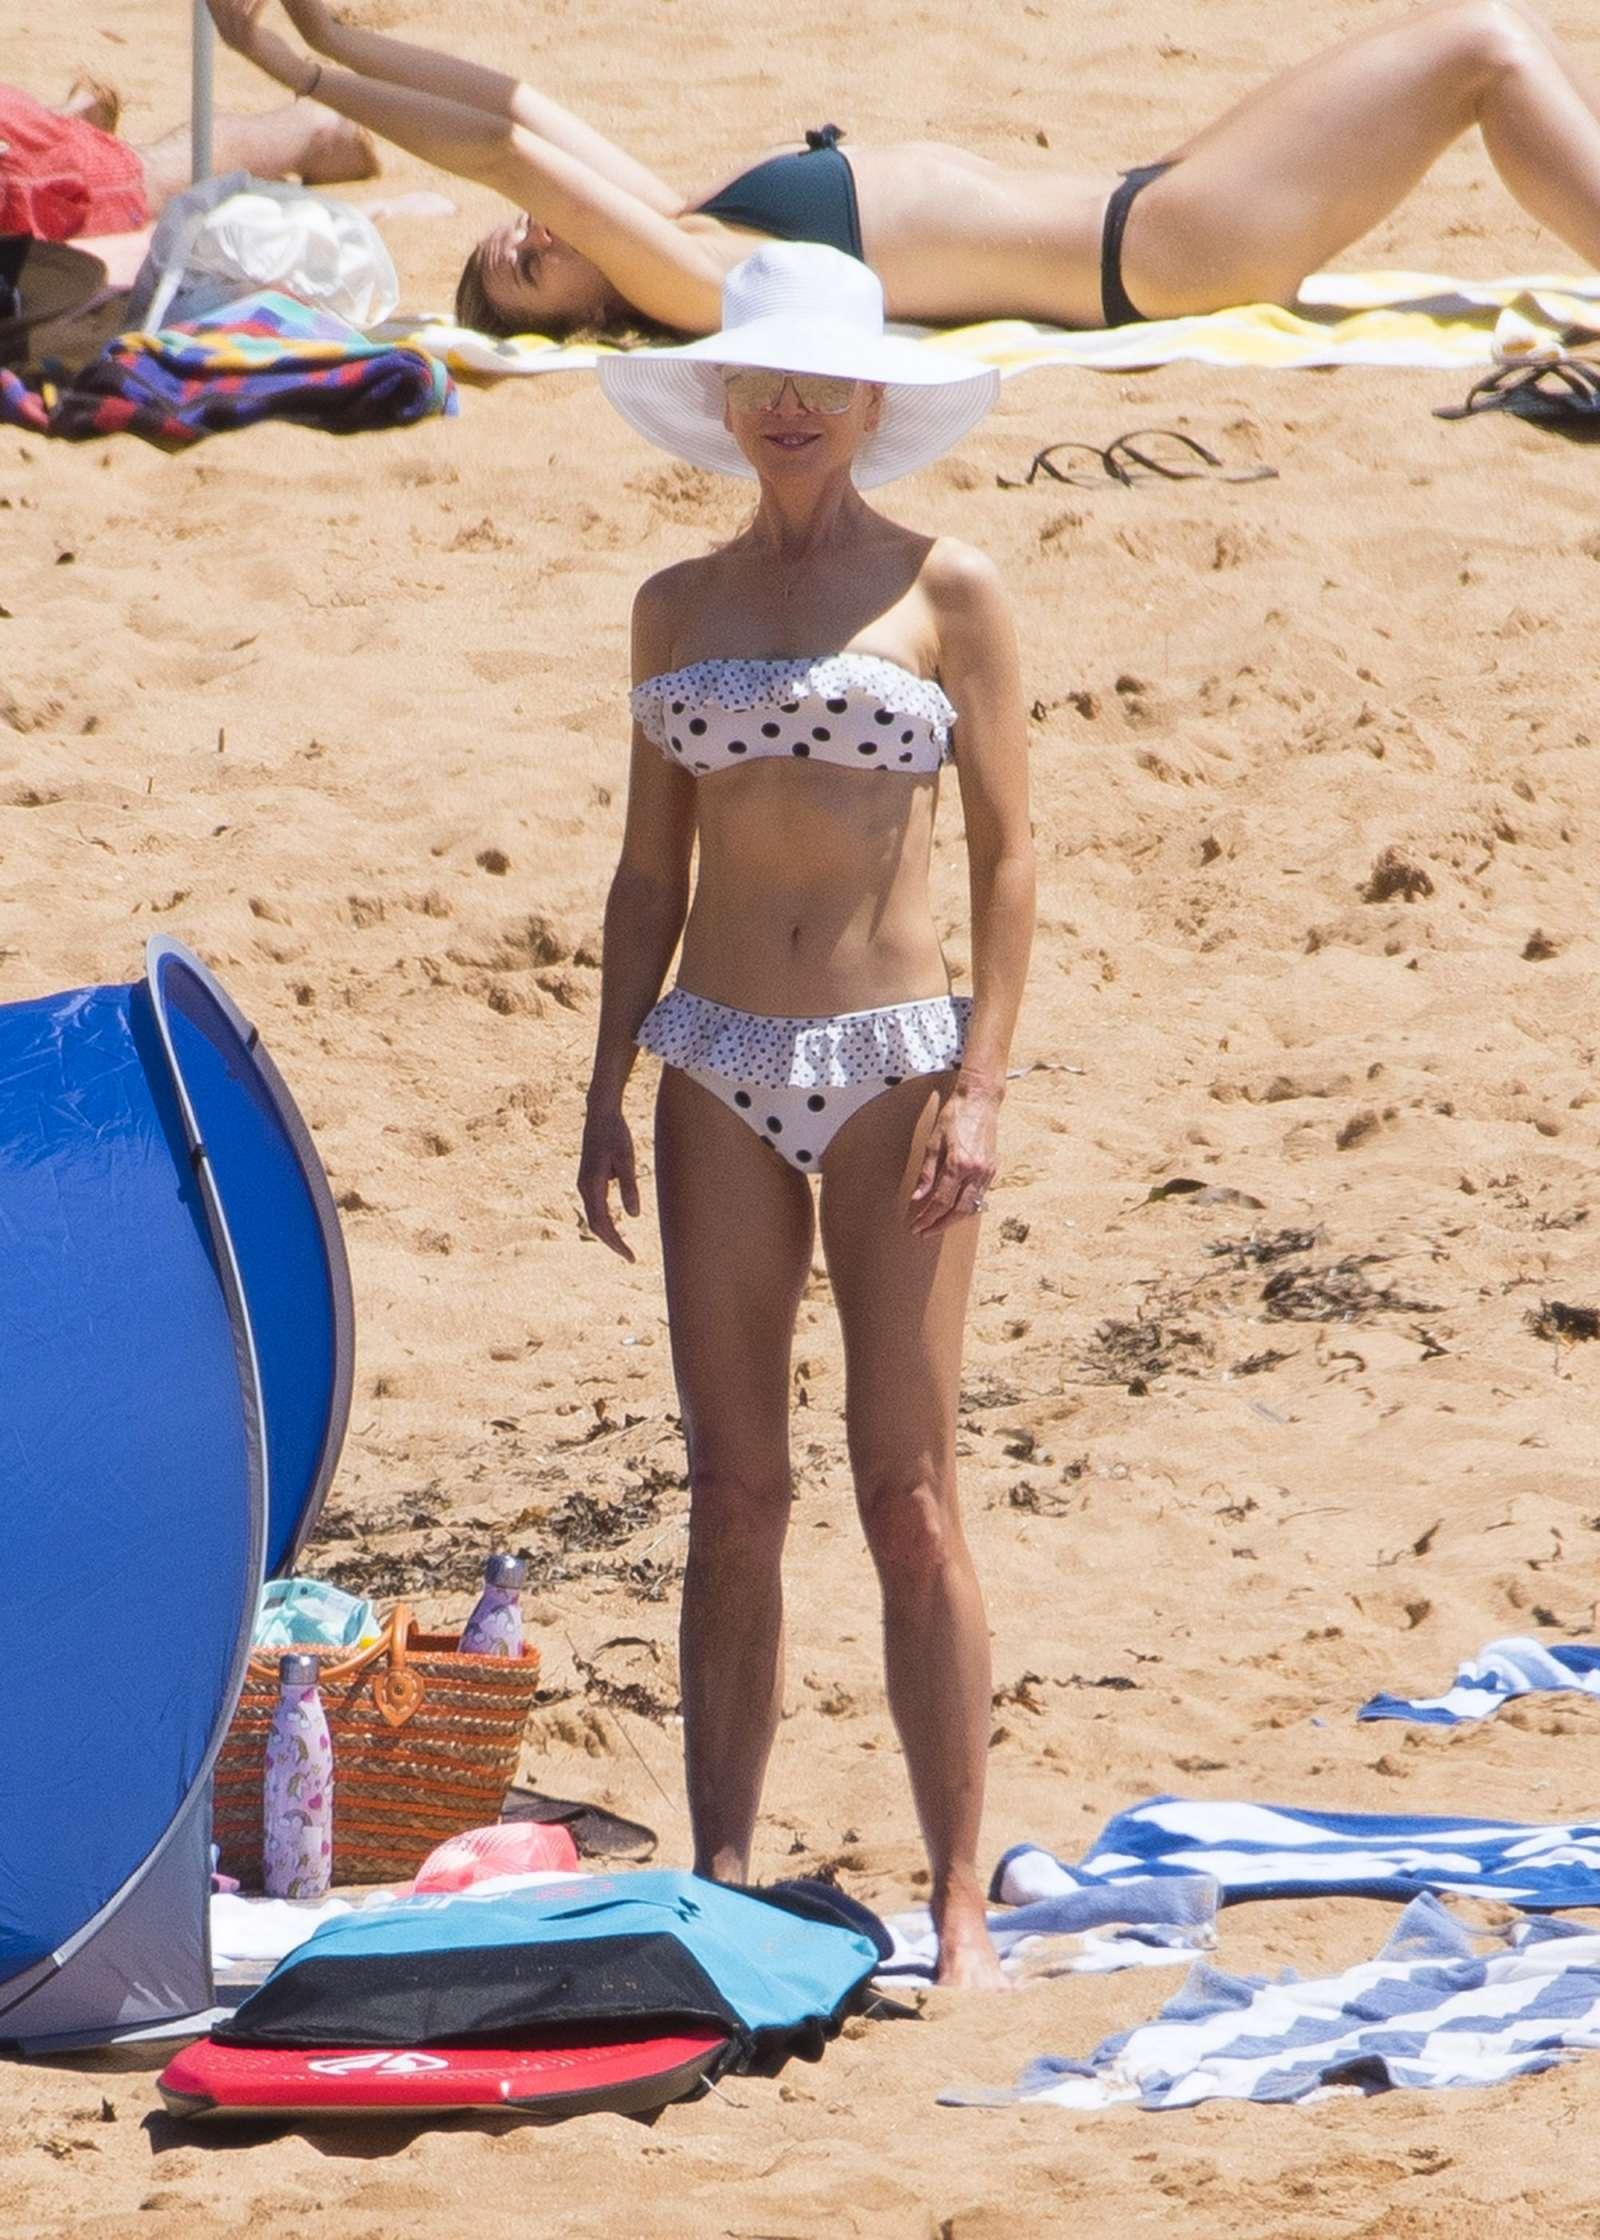 Nicole Kidman in White Polka Dot Bikini in Sydney